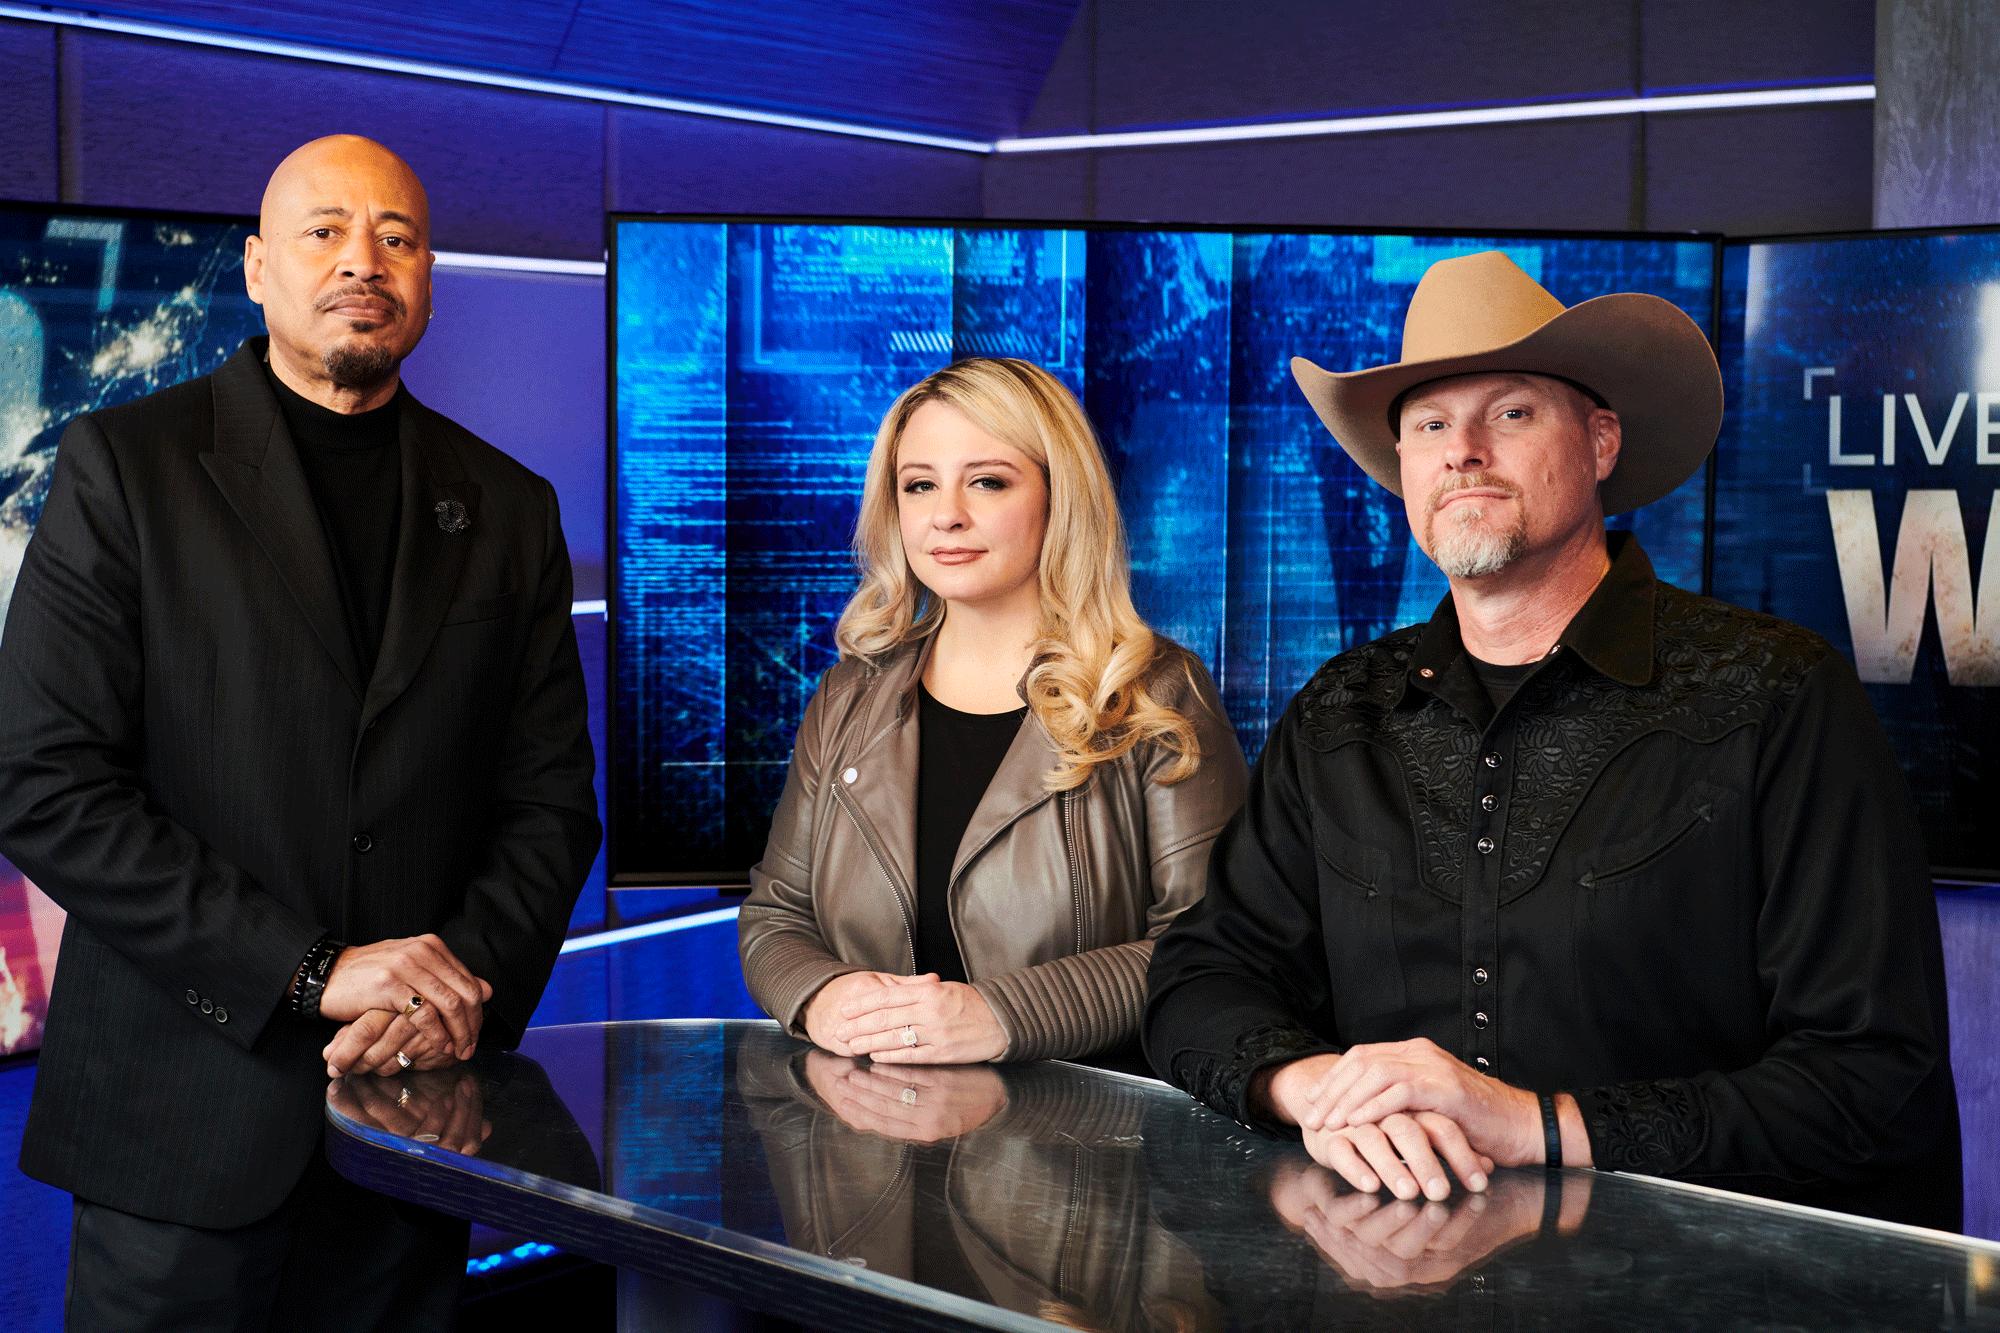 Live PD: Wanted's Tom Morris Jr. Michelle Sigona and Sheriff Mark Lamb